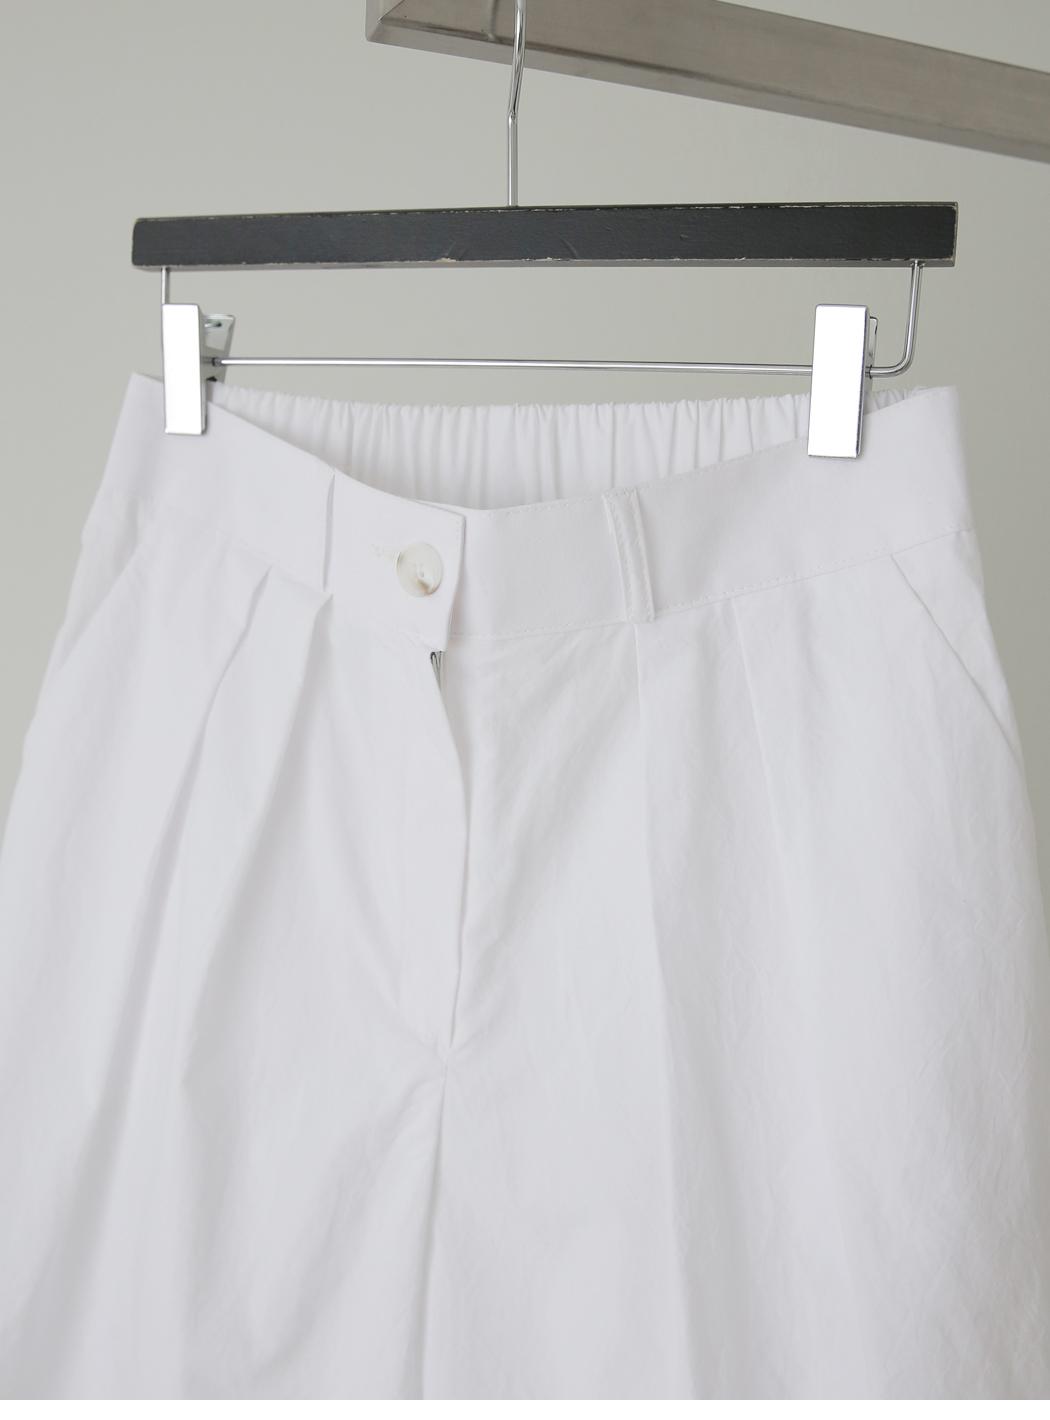 Mod Baslock 5-Buff Pin Tuck Pants